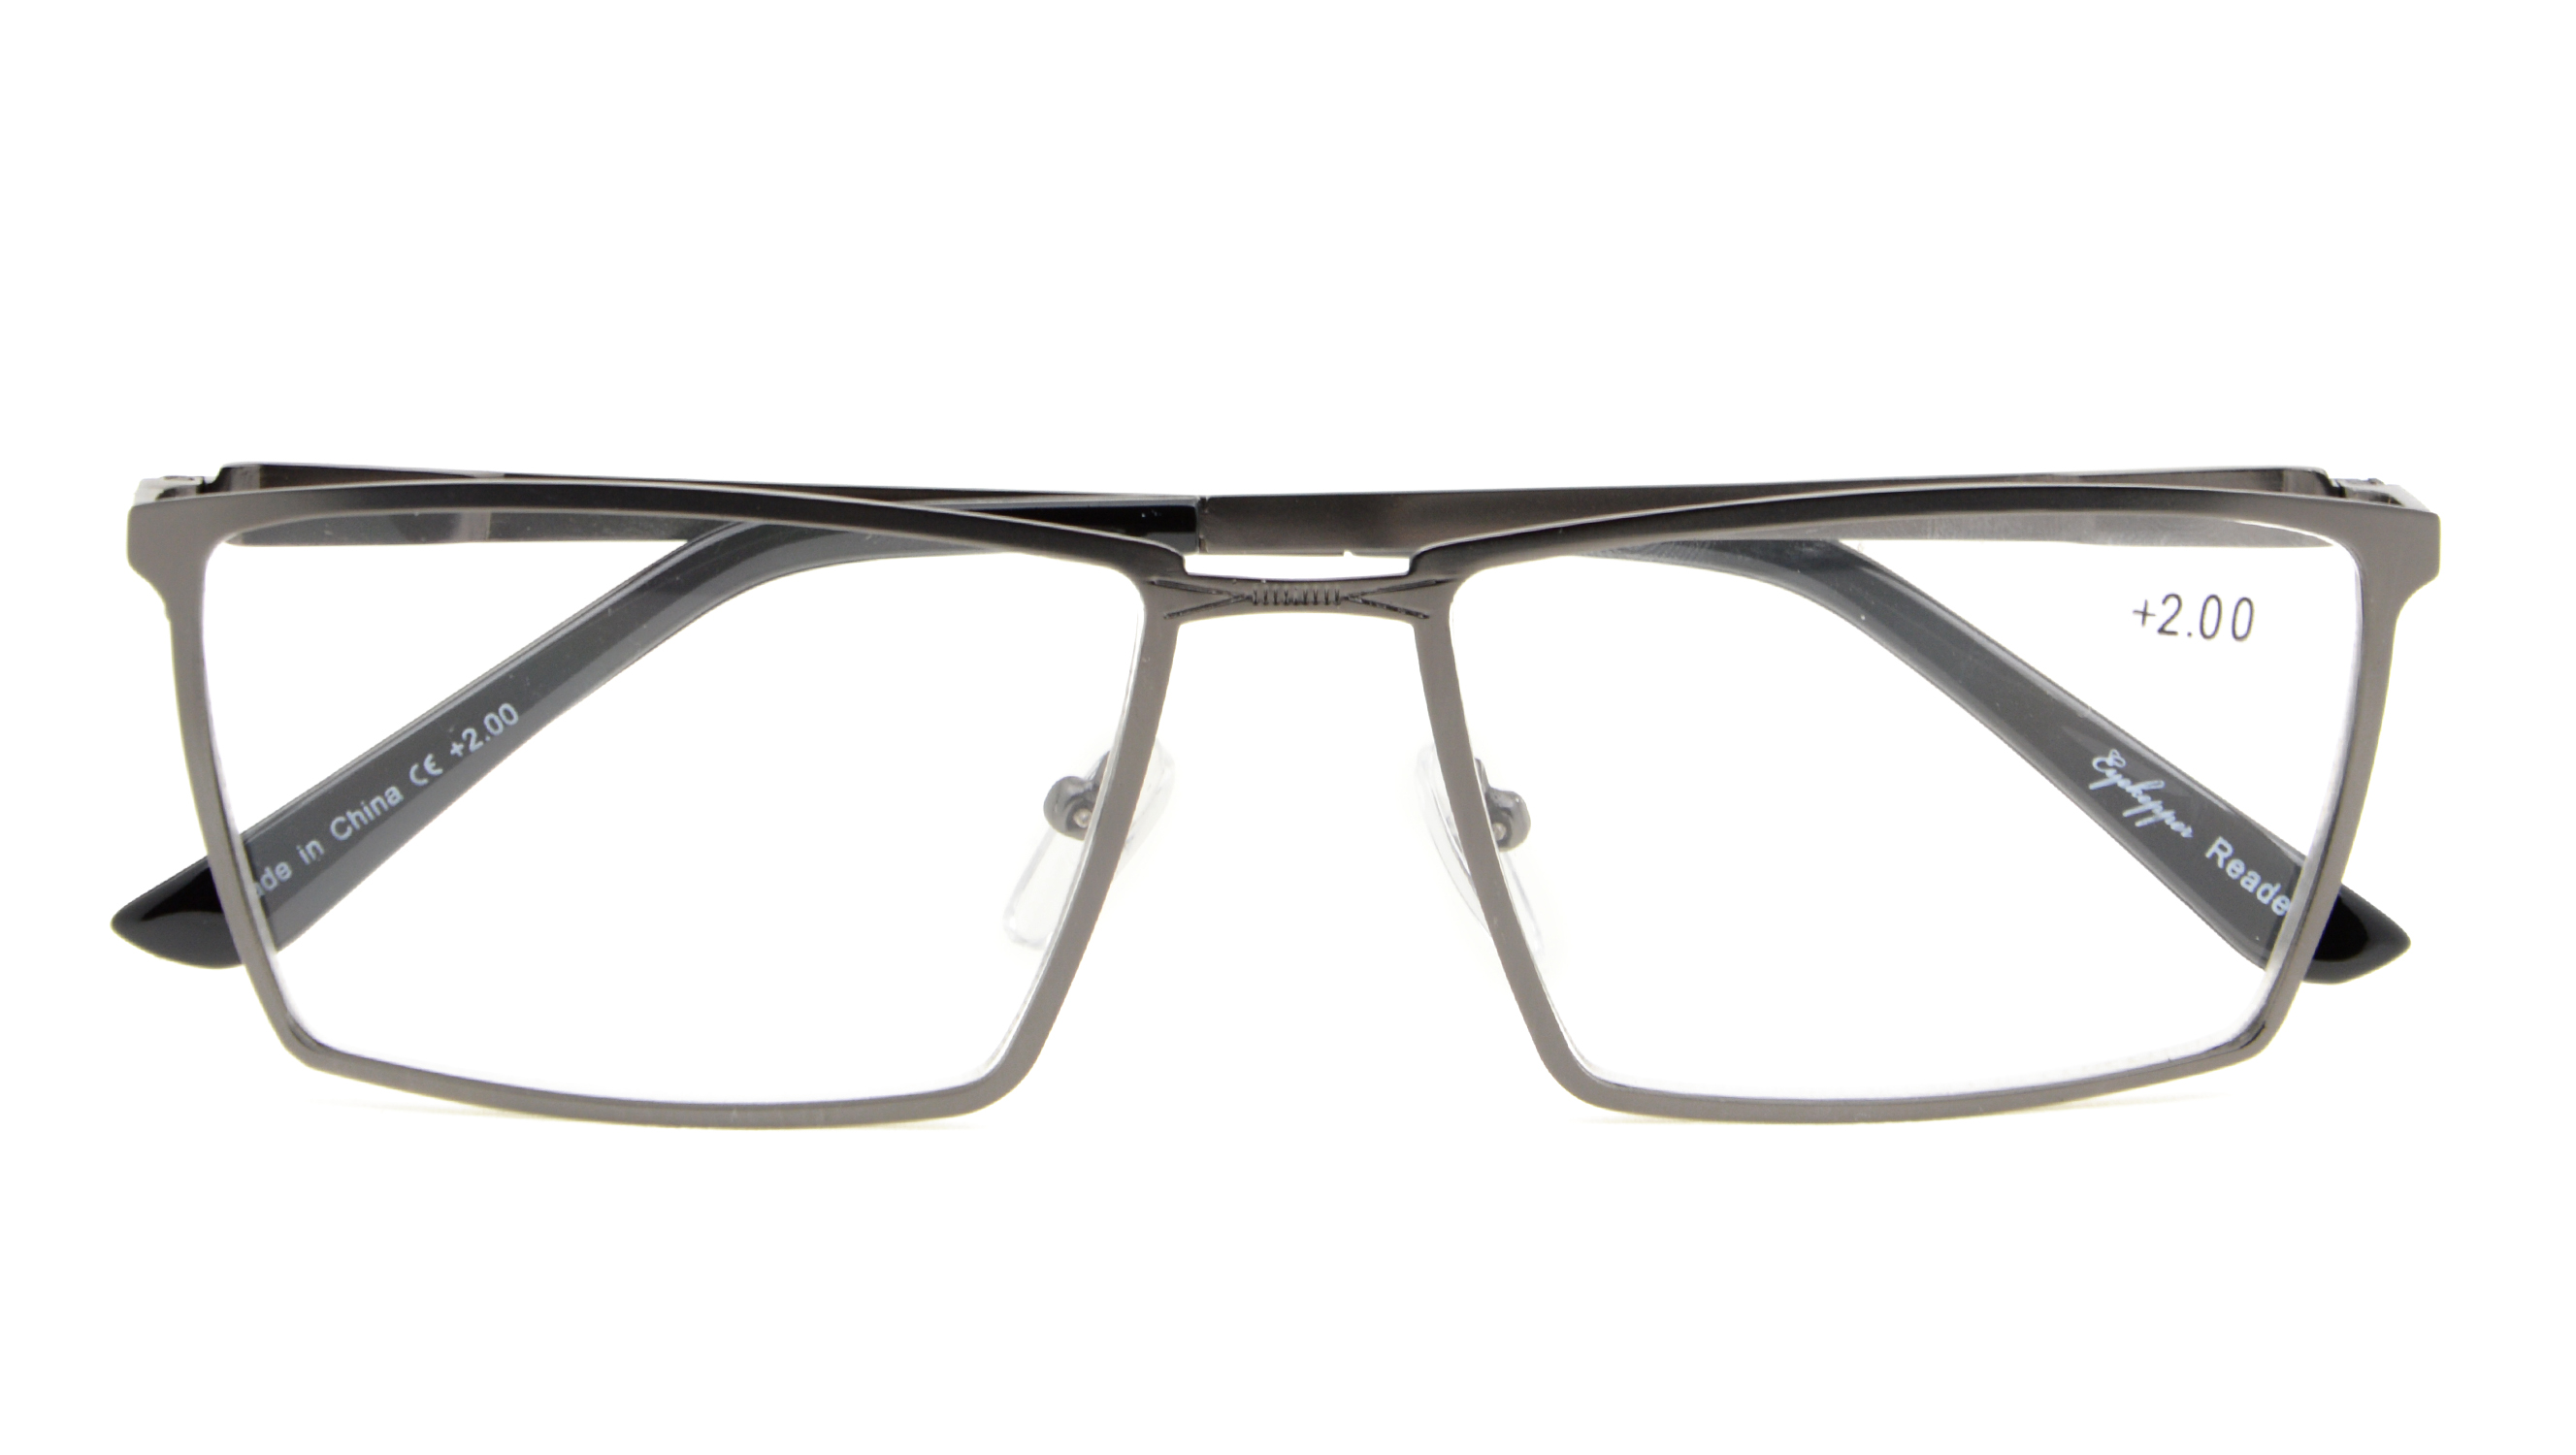 35dd894c3ae Eyekepper Spring Hinges Reading Glasses R1637